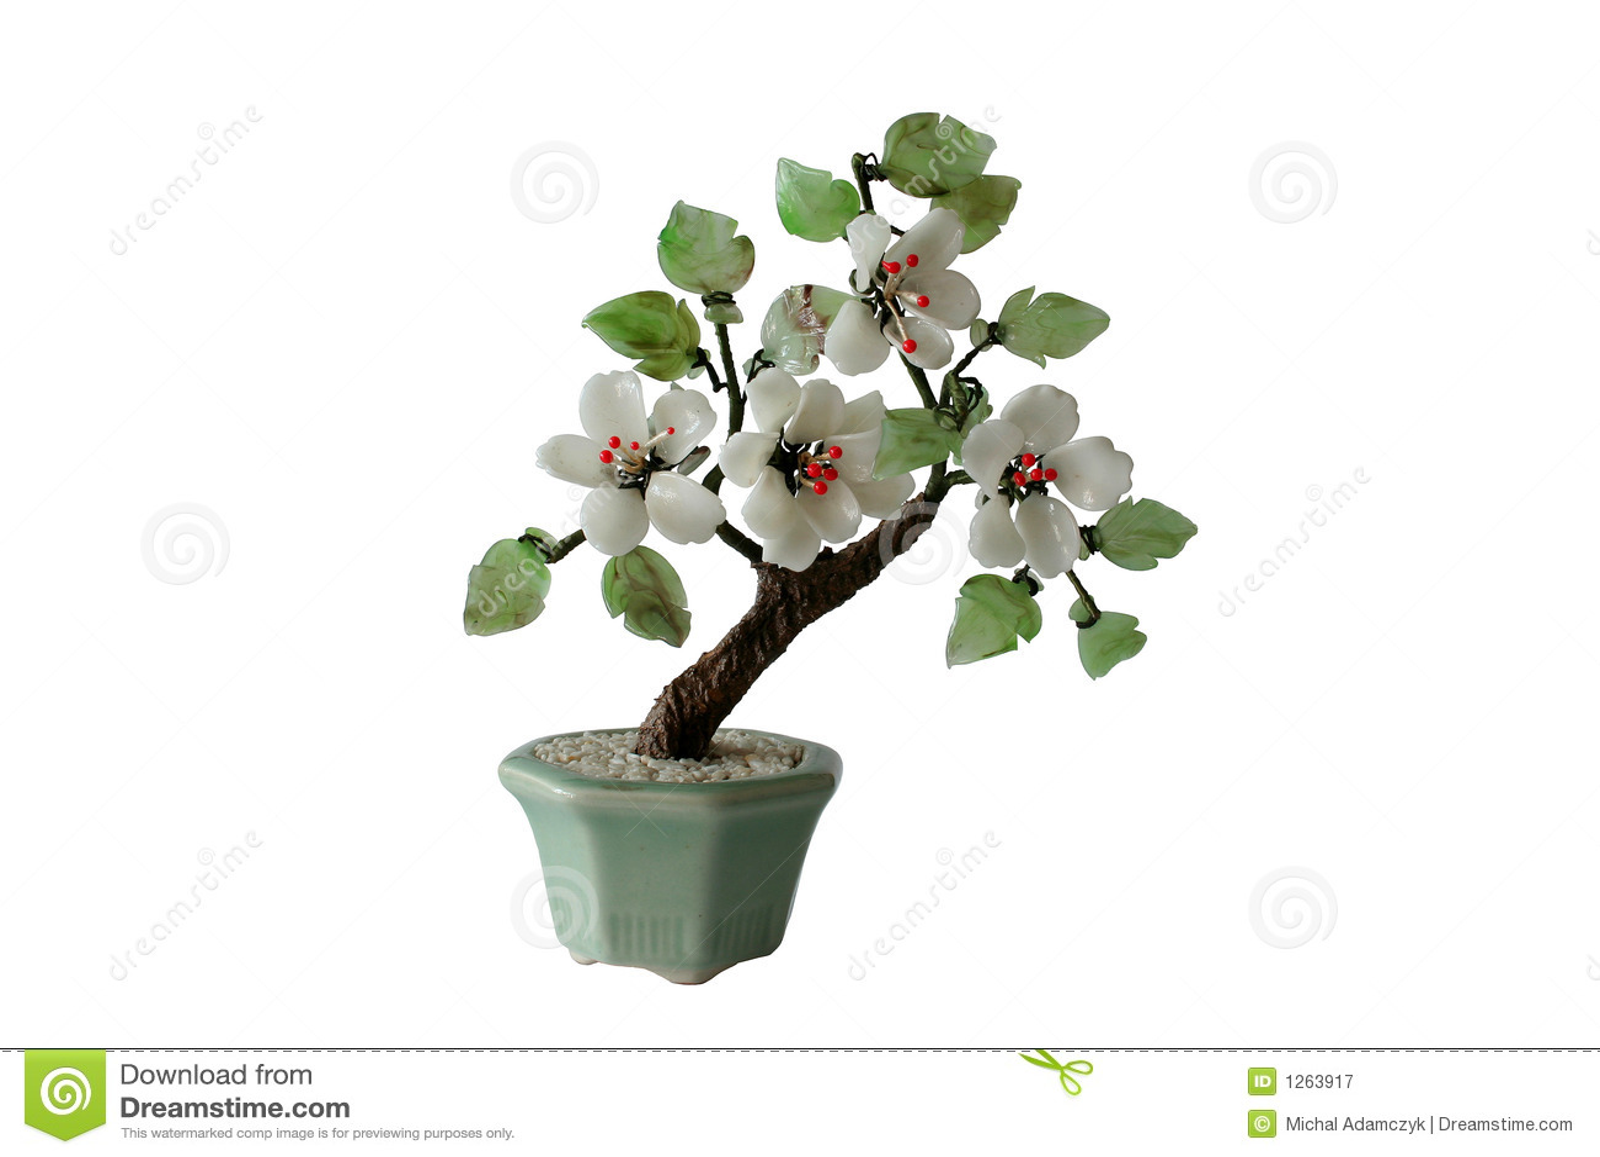 Model of bonzai tree (isolated)